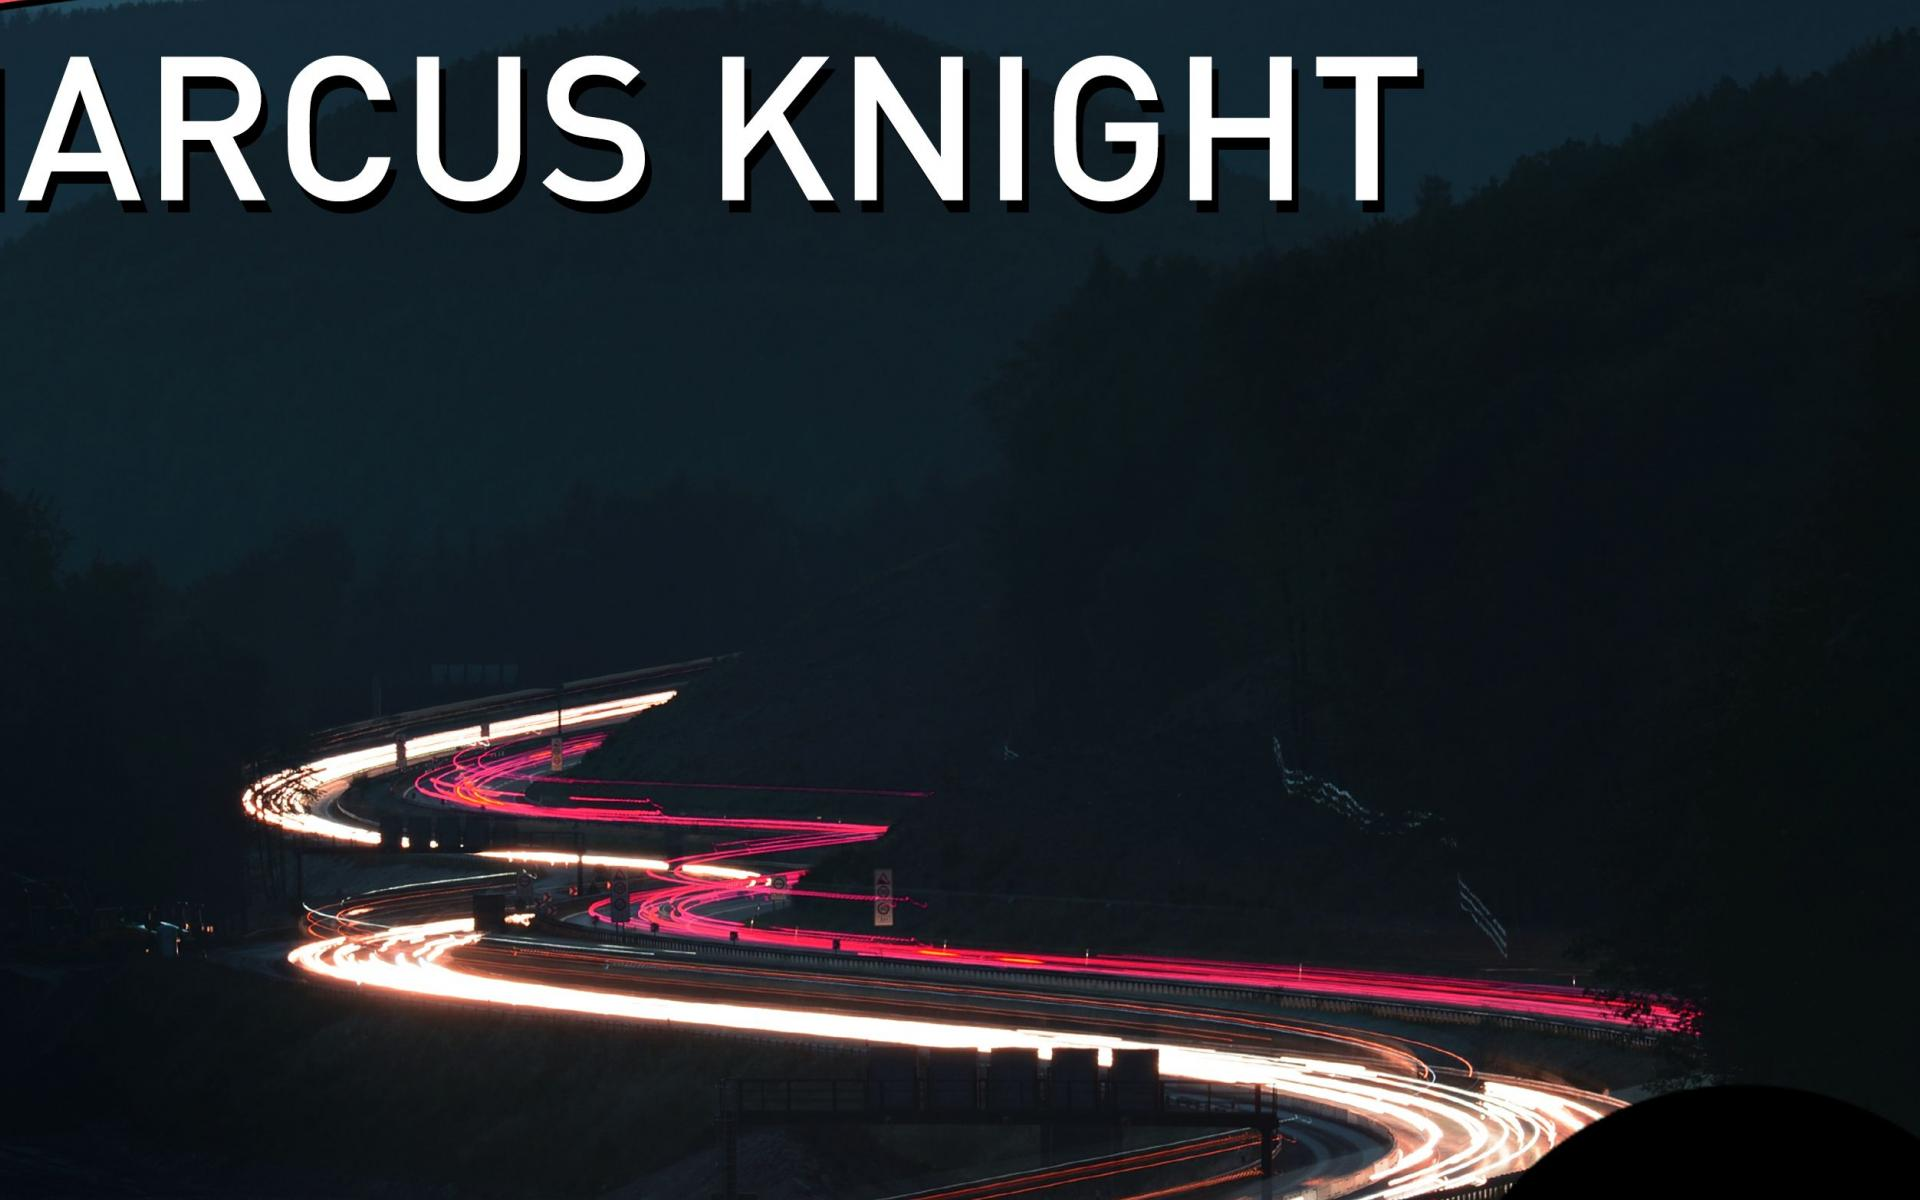 Marcus Knight